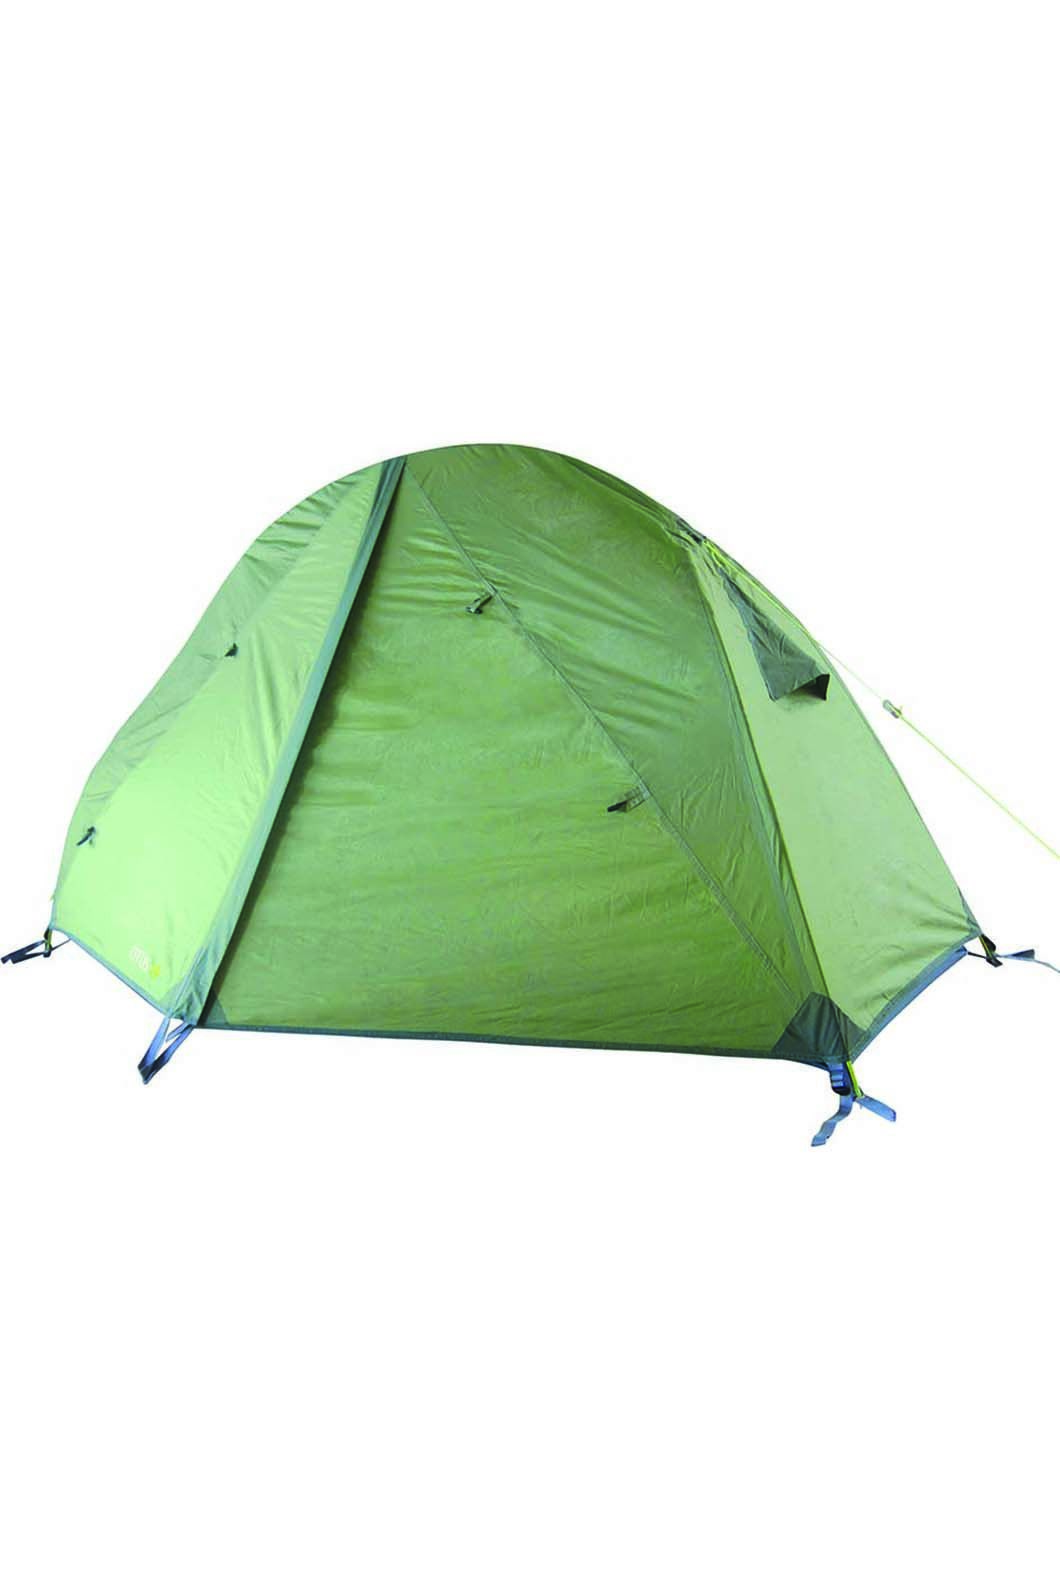 Outrak Ot Person Hiking Tent, None, hi-res